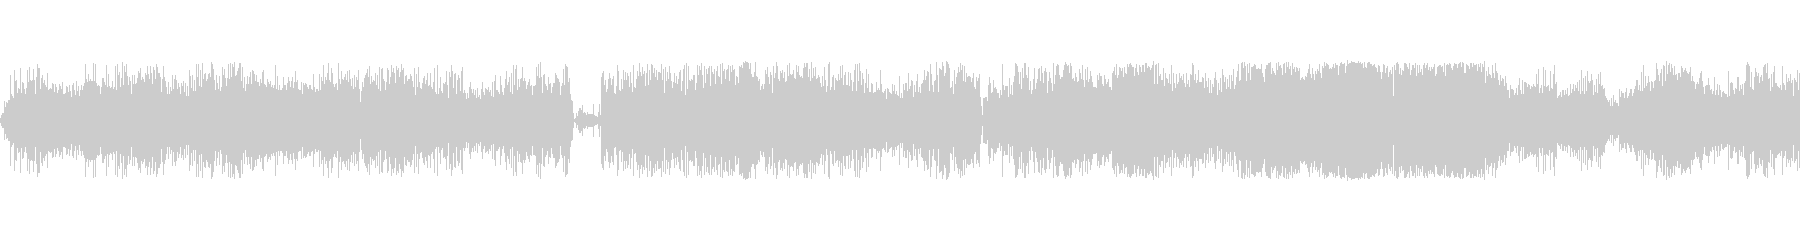 SHORTWAVE RADIO:送...の未再生の波形